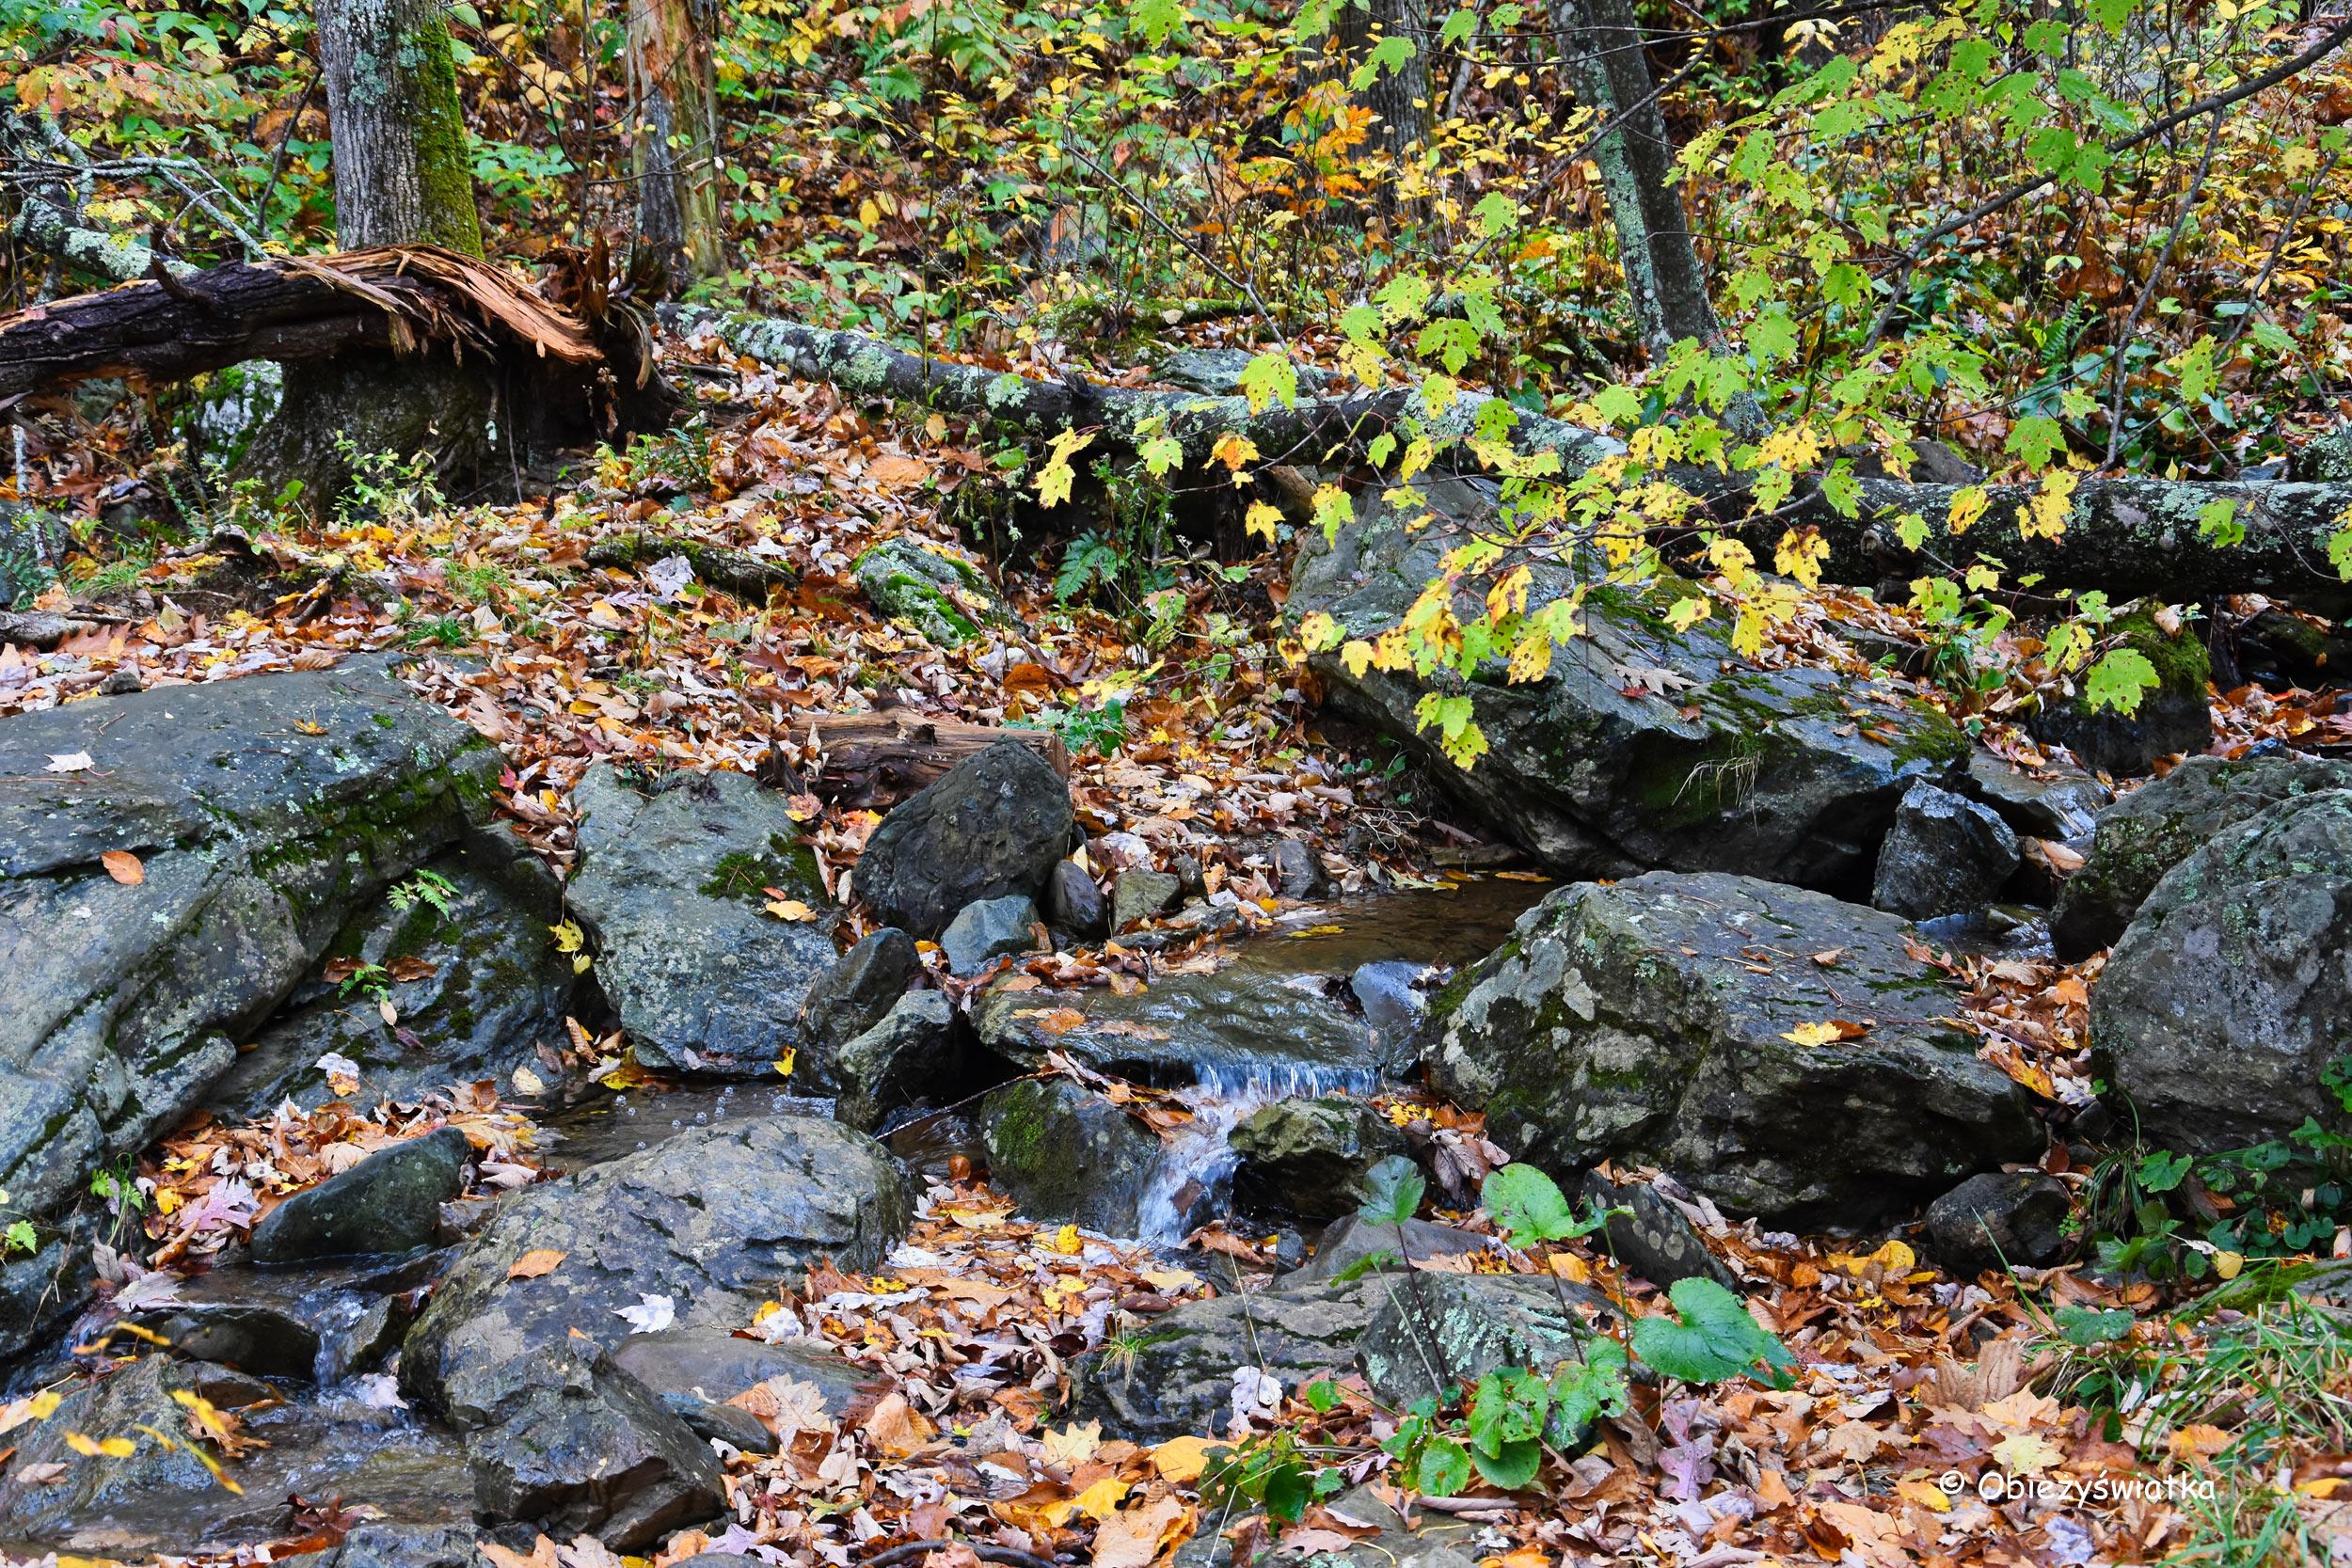 Na szlaku - Appalachian Trail - Park Narodowy Shenandoah, USA